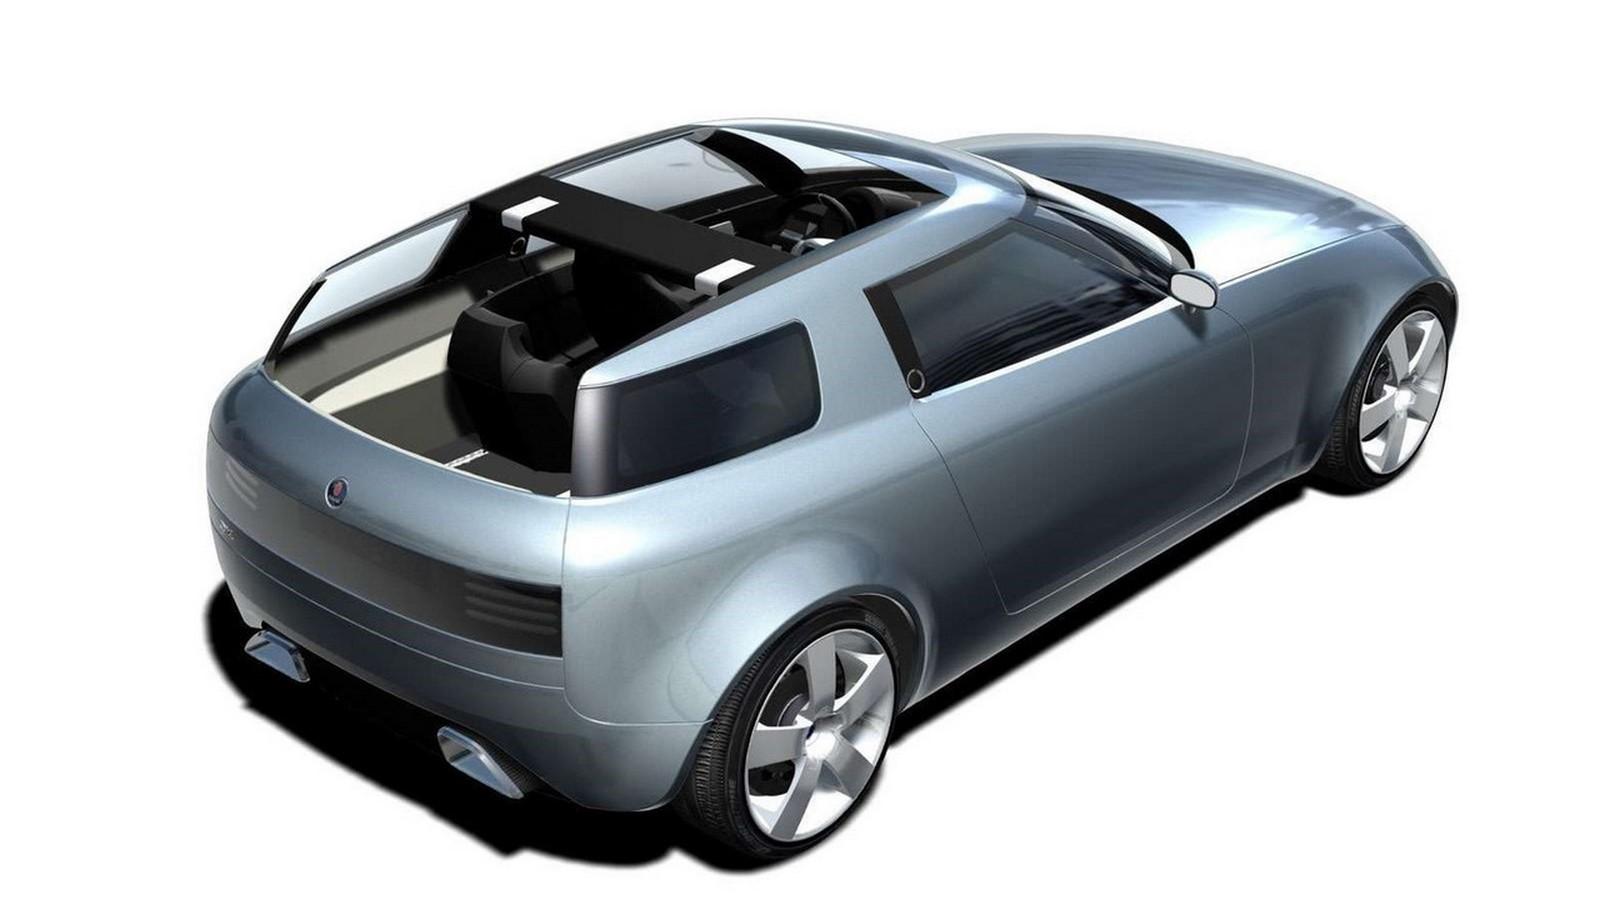 2001-saab-9x-concept (29)